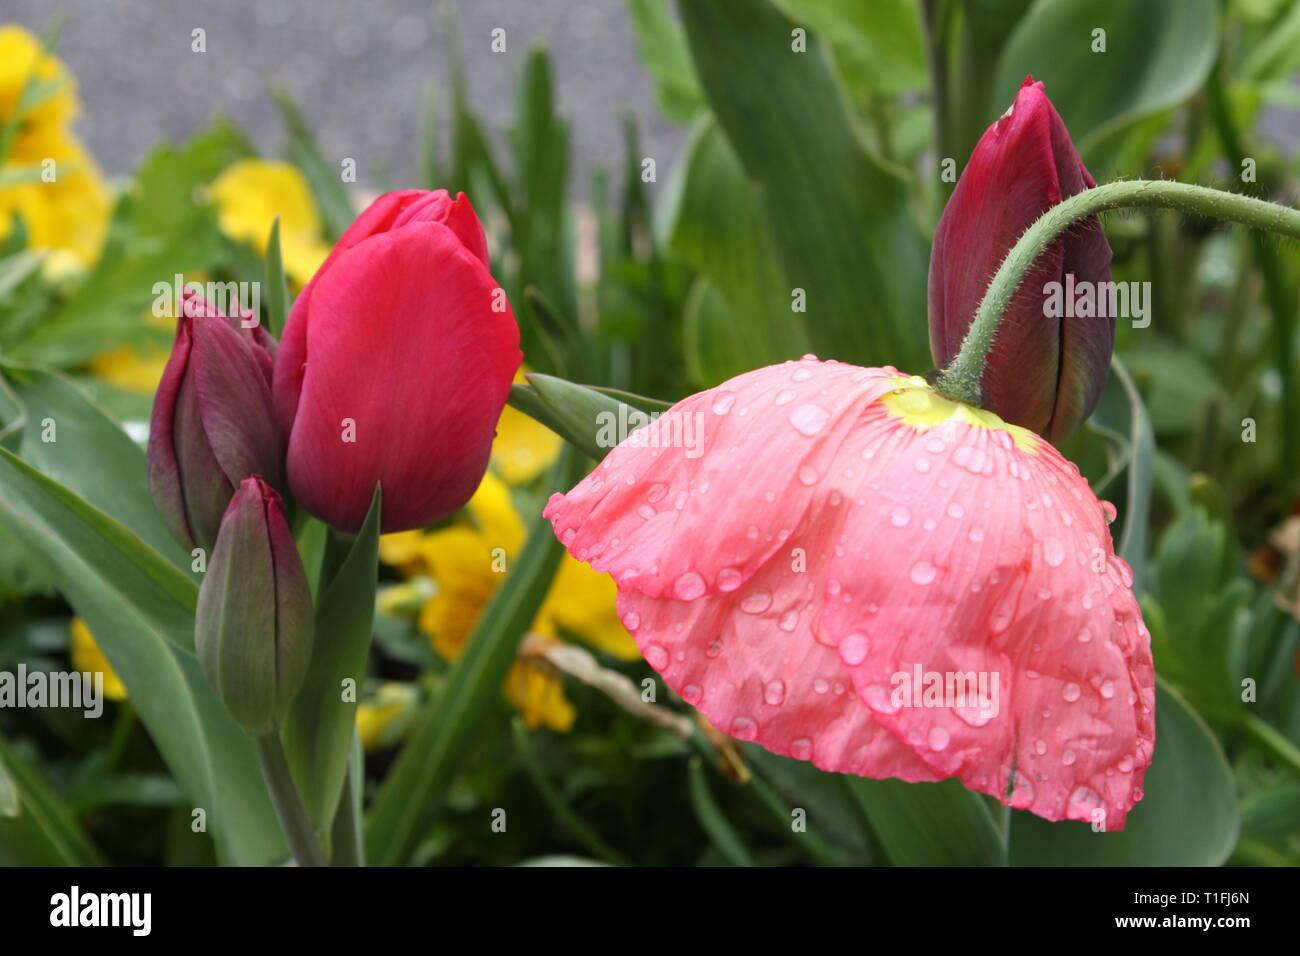 Tulips flowers in spring season Stock Photo